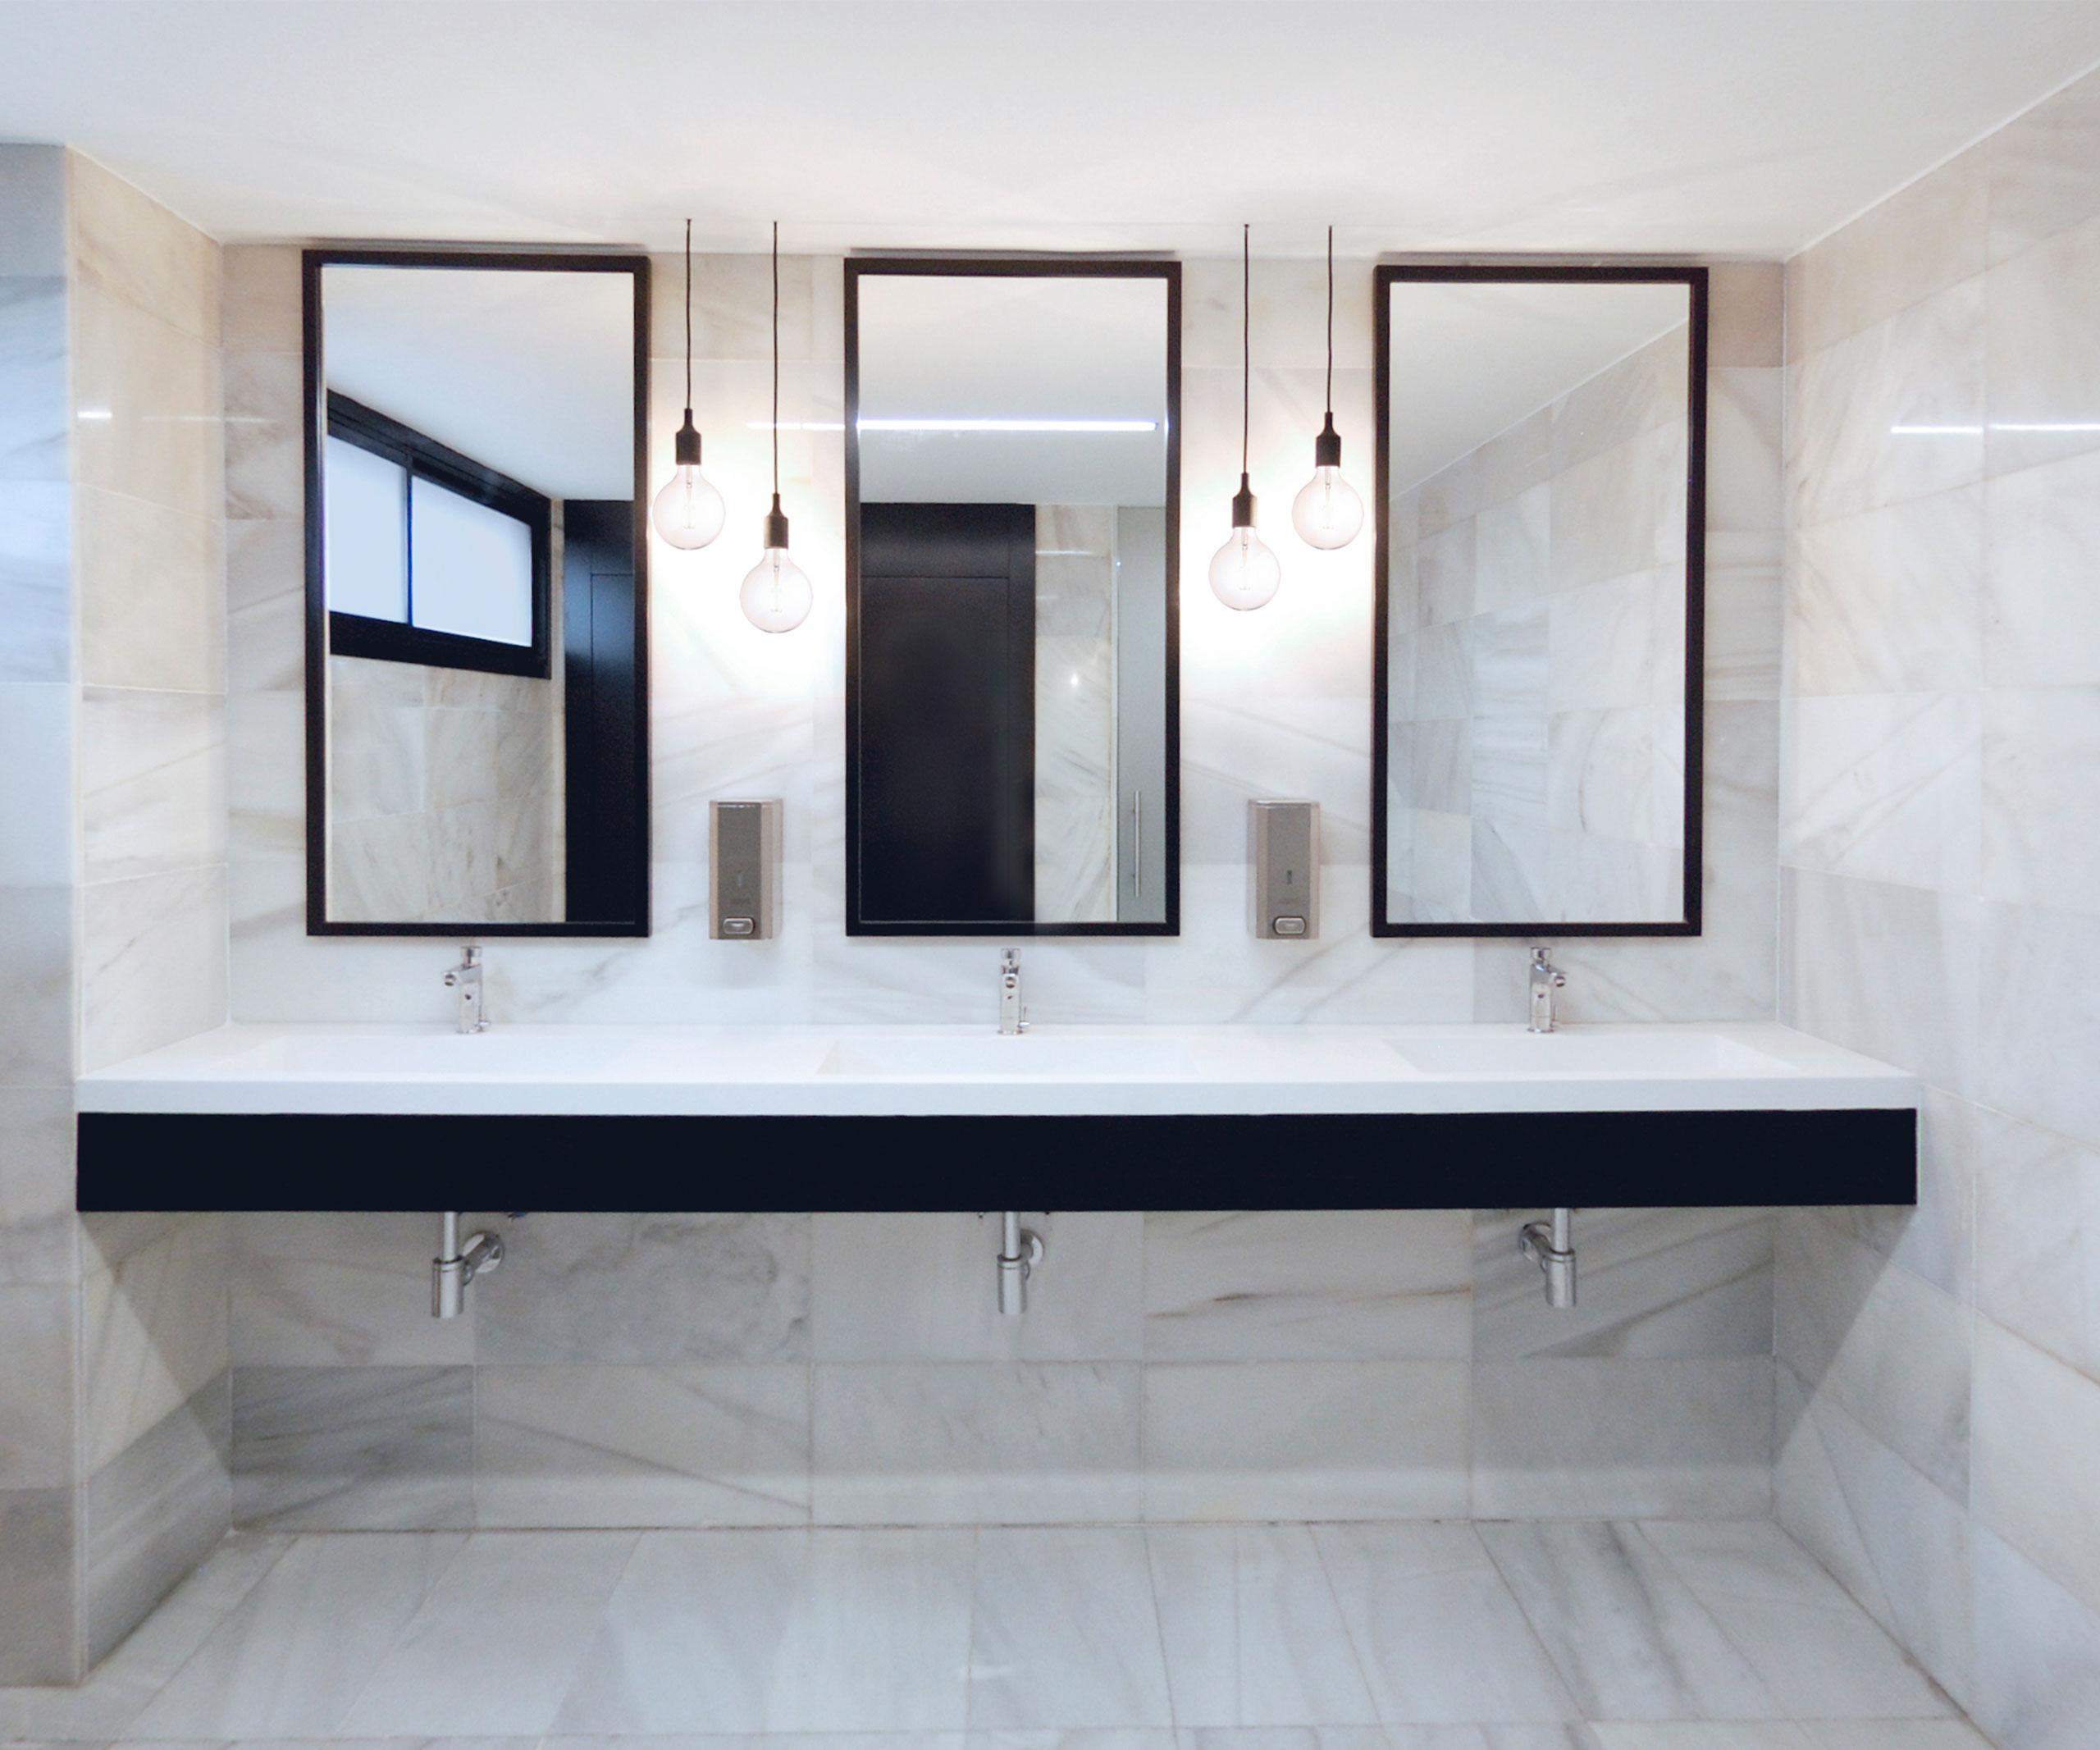 arquitectura_corporativa_diseno_wc_aseos_oficinas_blanco_negro_lavabos_porcelanosa_lamparas_muuto